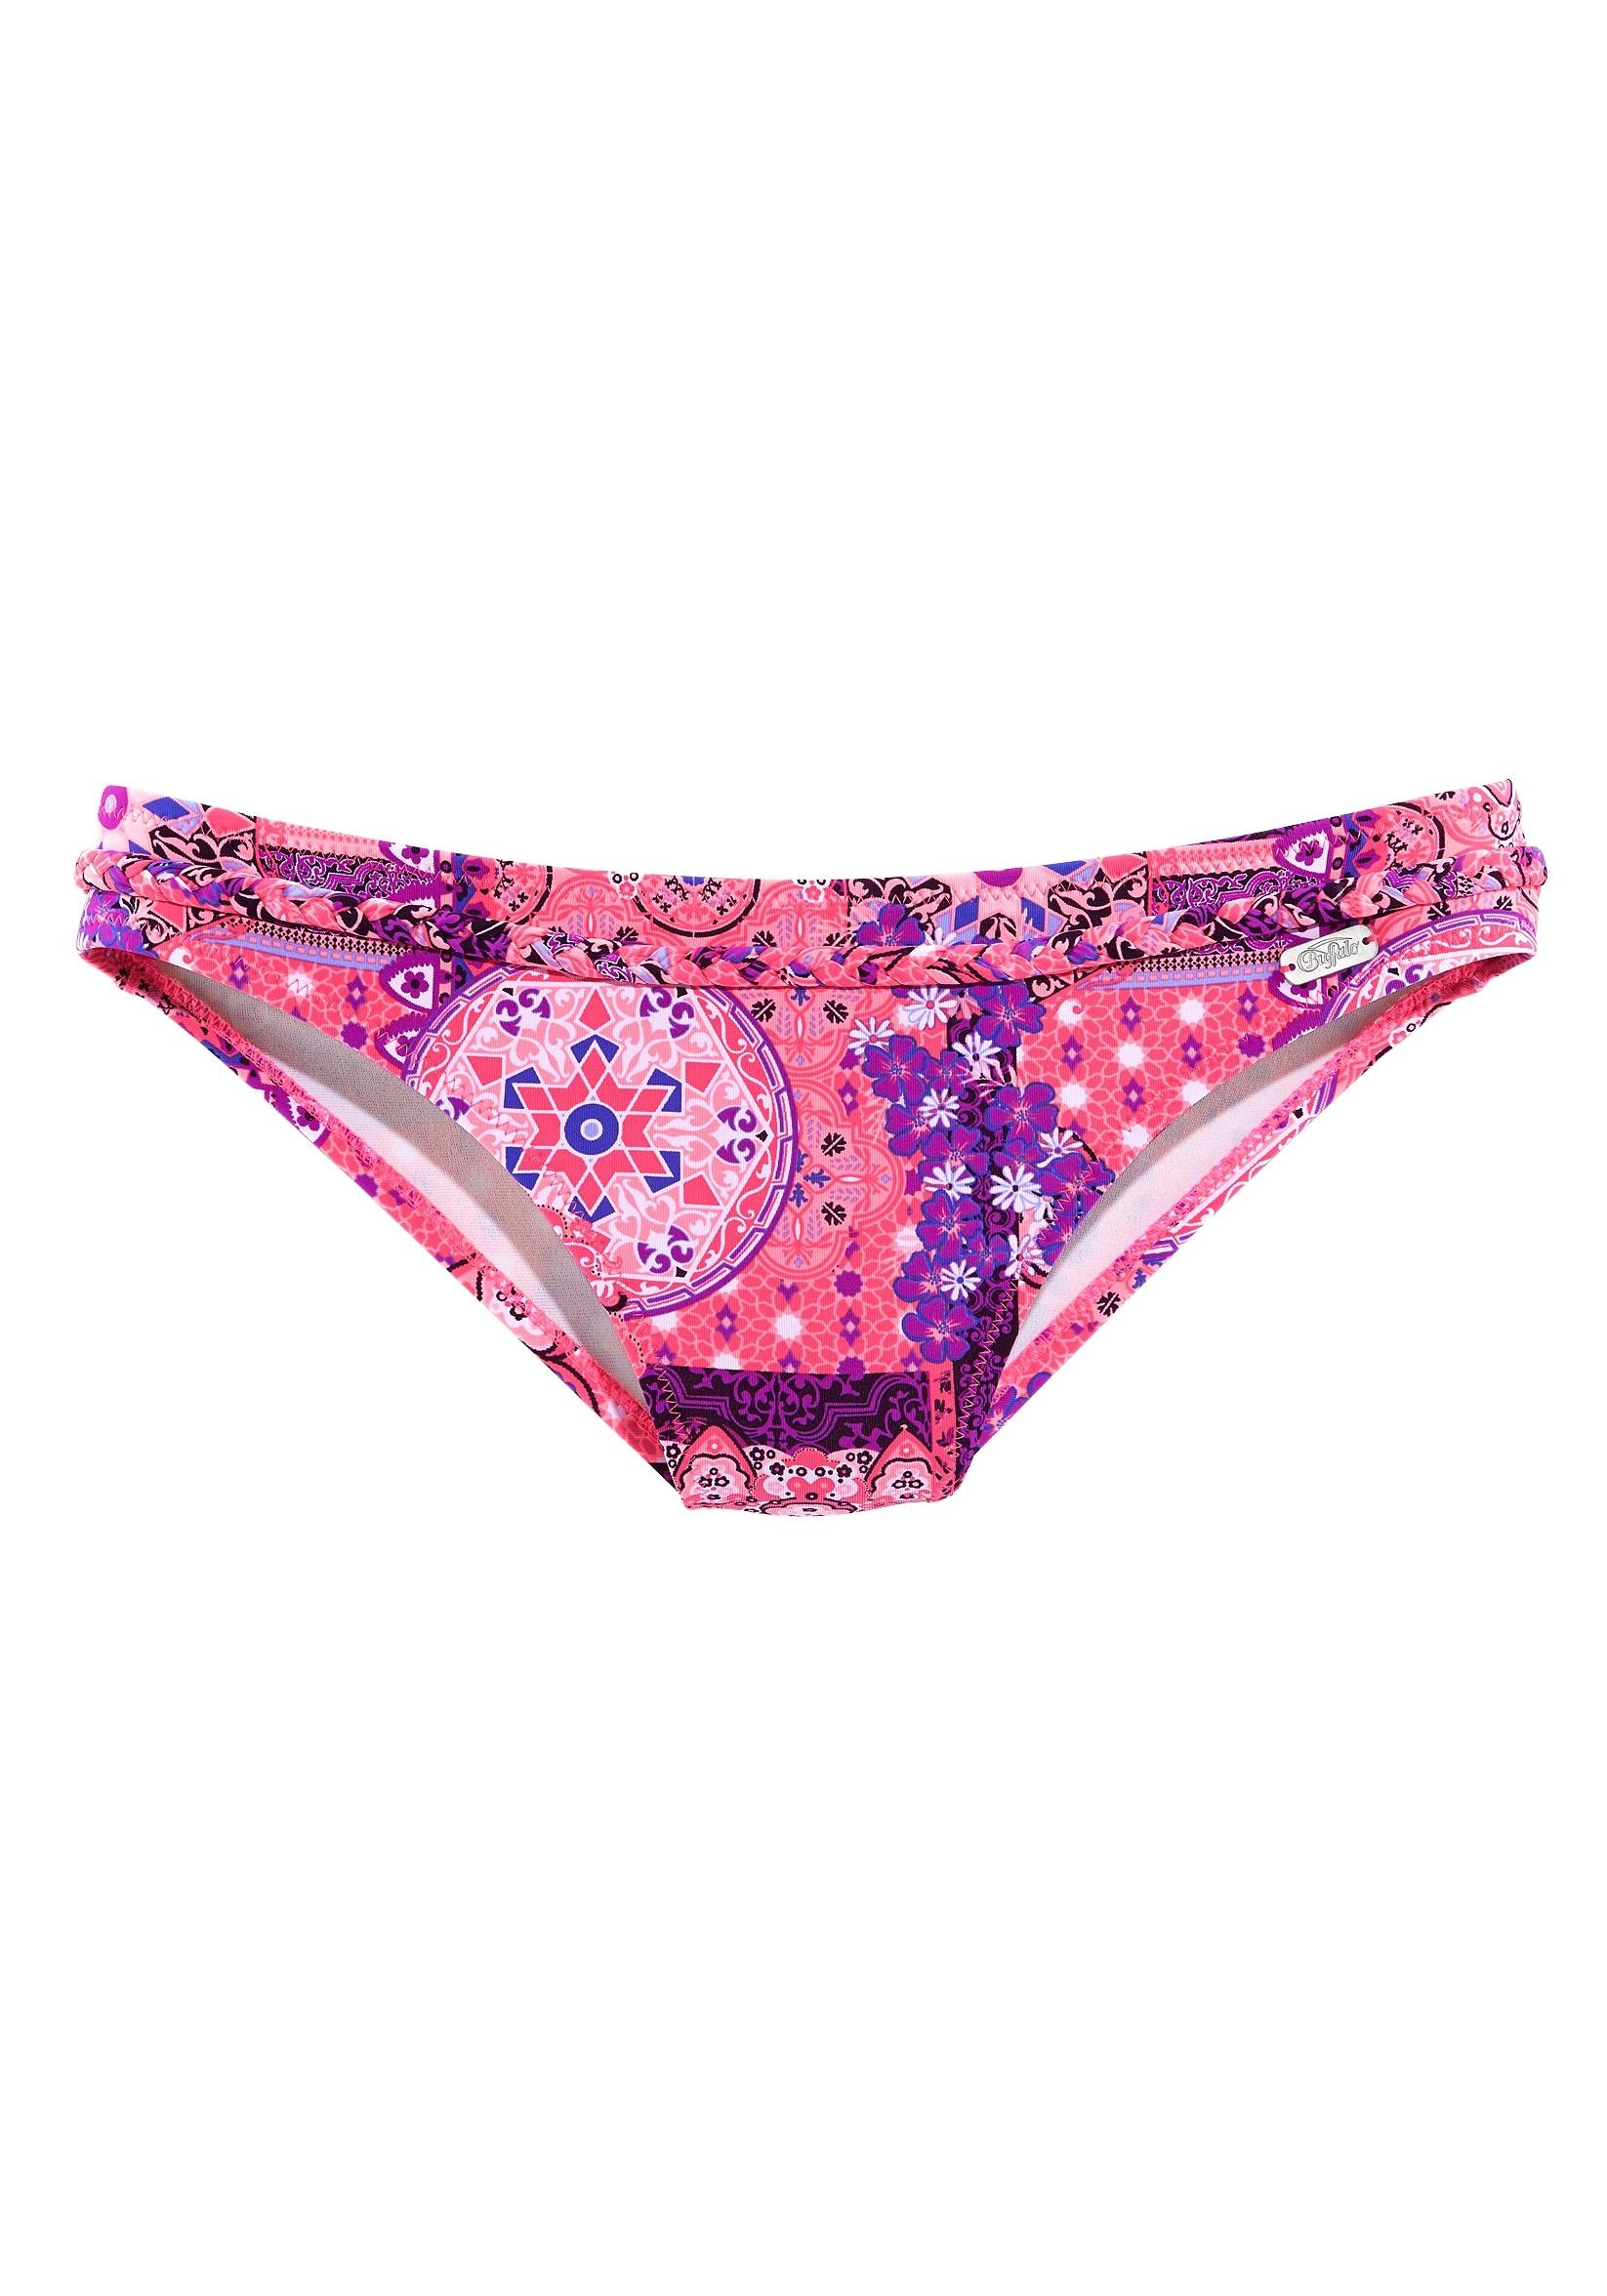 Buffalo bikinibroekje Shari met gevlochten sierriem in de webshop van Lascana kopen